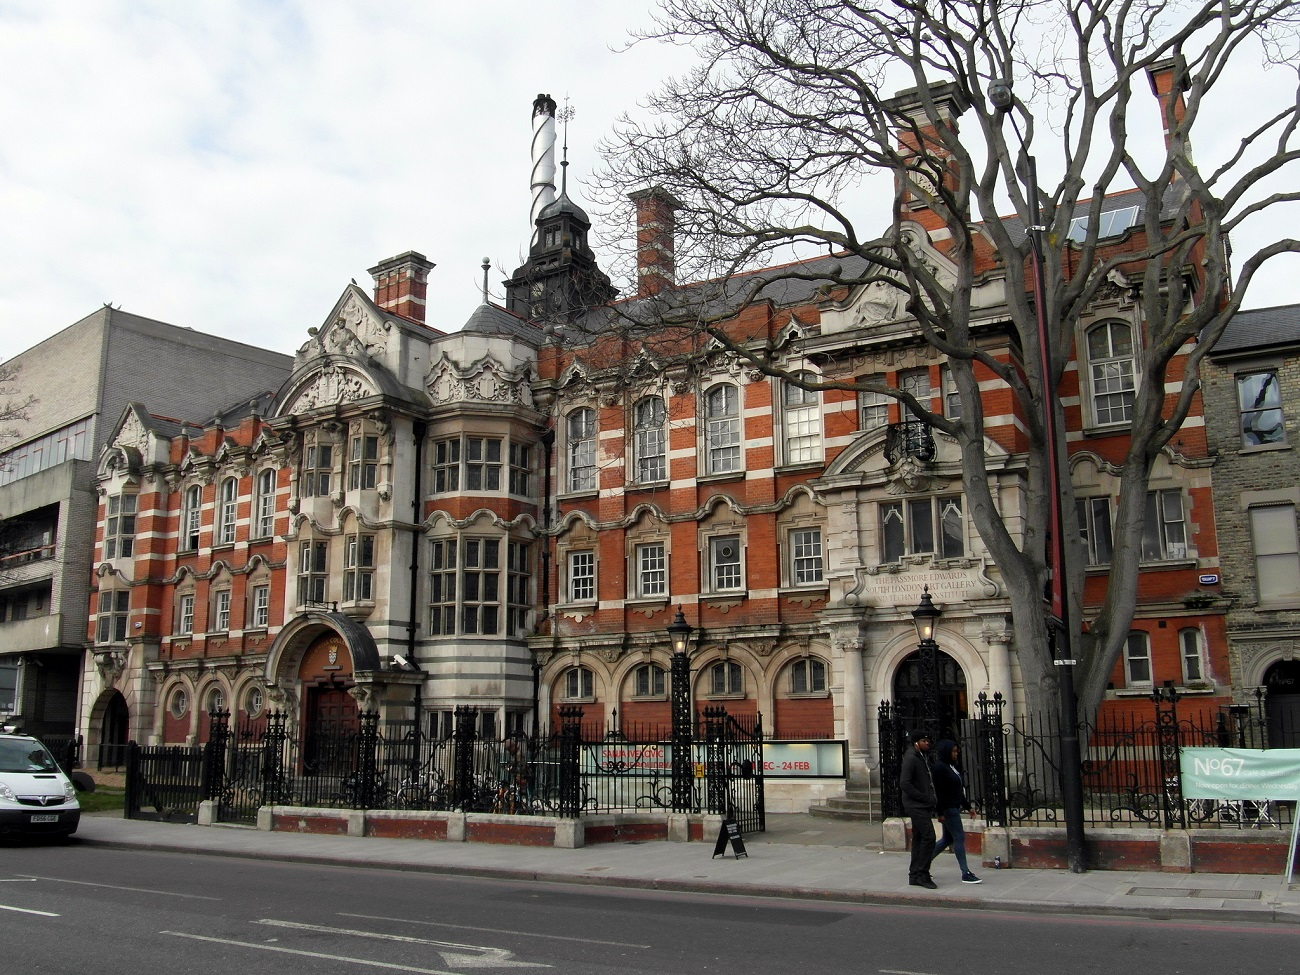 A destra, in primo piano, la South London Art Gallery, accanto alla Camberwell School of Arts, Londra. Ph. by Reading Tom via Flickr